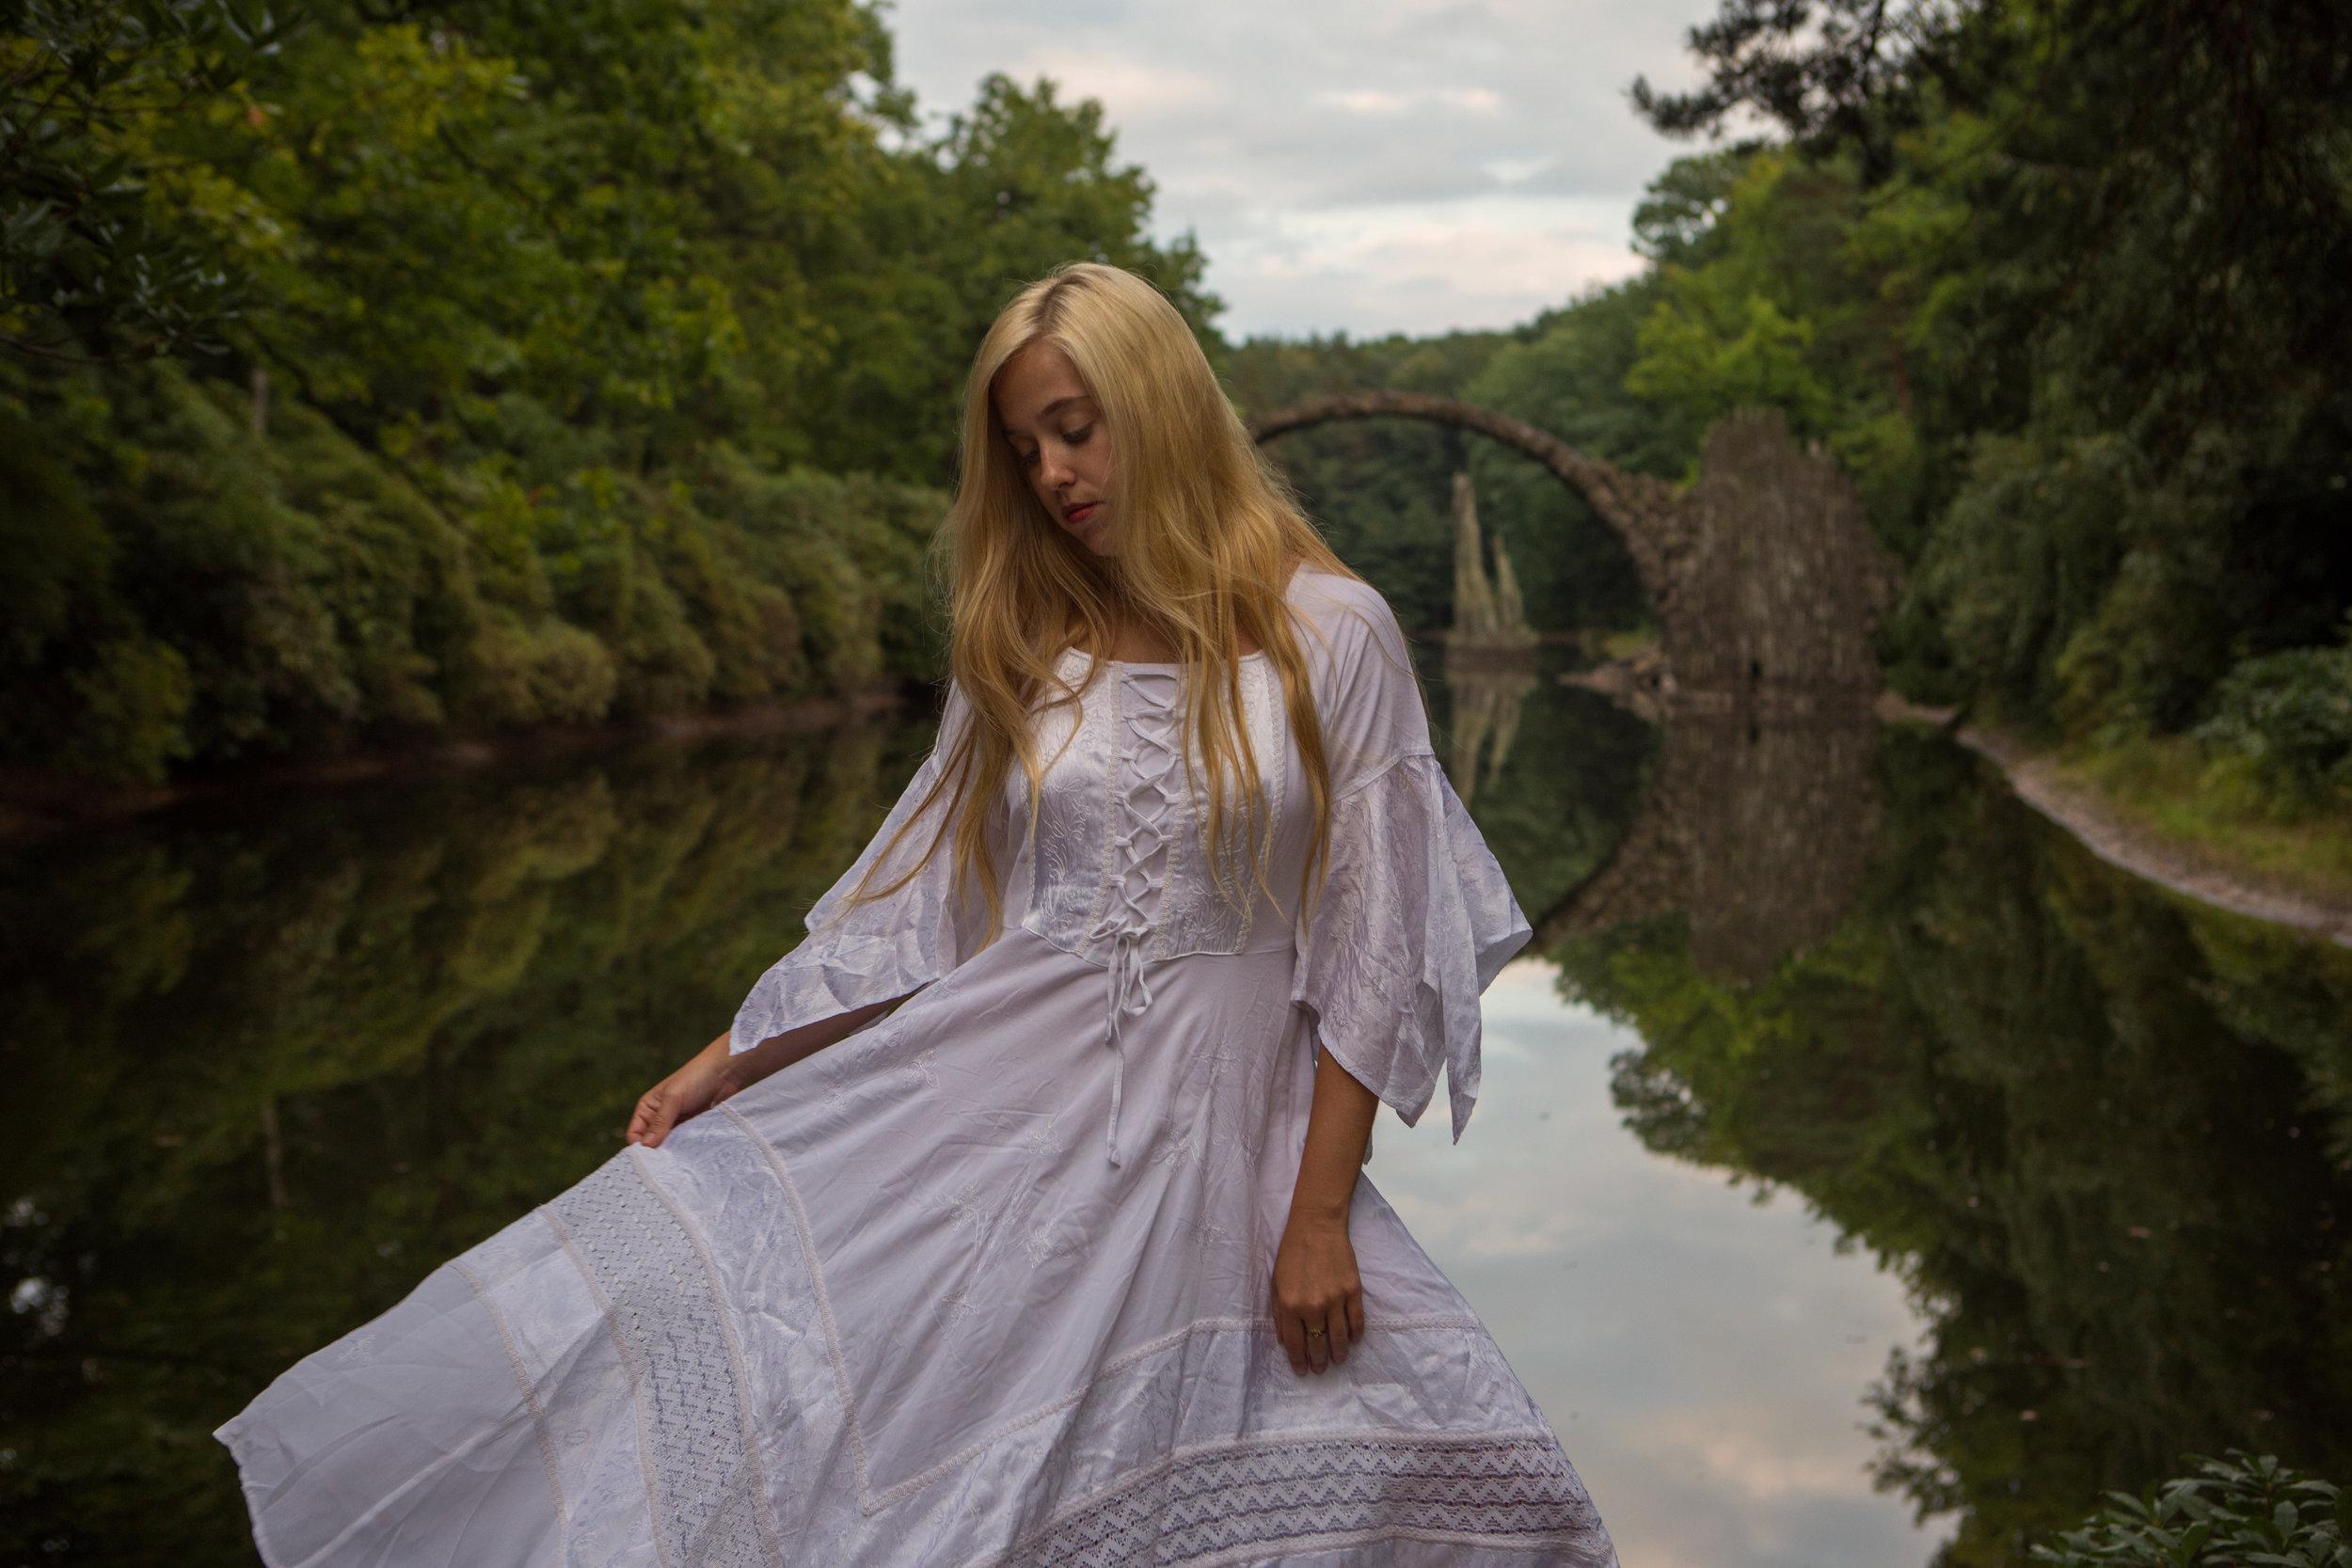 AstroBandit_DariusTwin_Proposal_Kromlau_Germany_Rakotzbrucke_Bridge_Reflection_Ring_WhiteDress_3.jpg